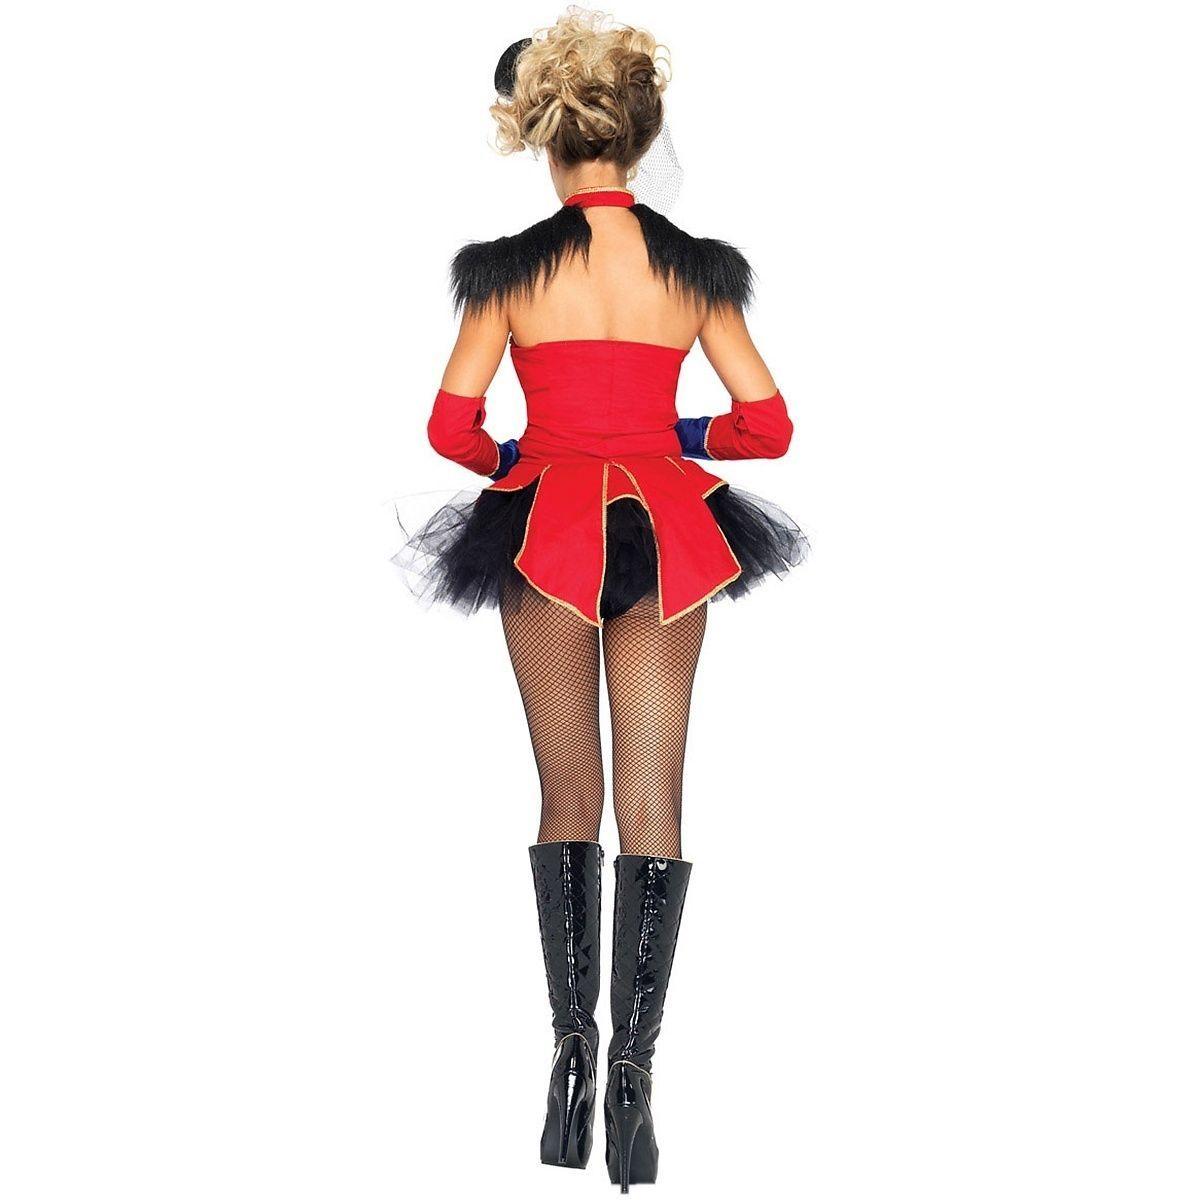 32f1cb19c Sexy Ring Master Mistress Womens Costume Circus Lion Tamer Halloween Fancy  Dress | eBay